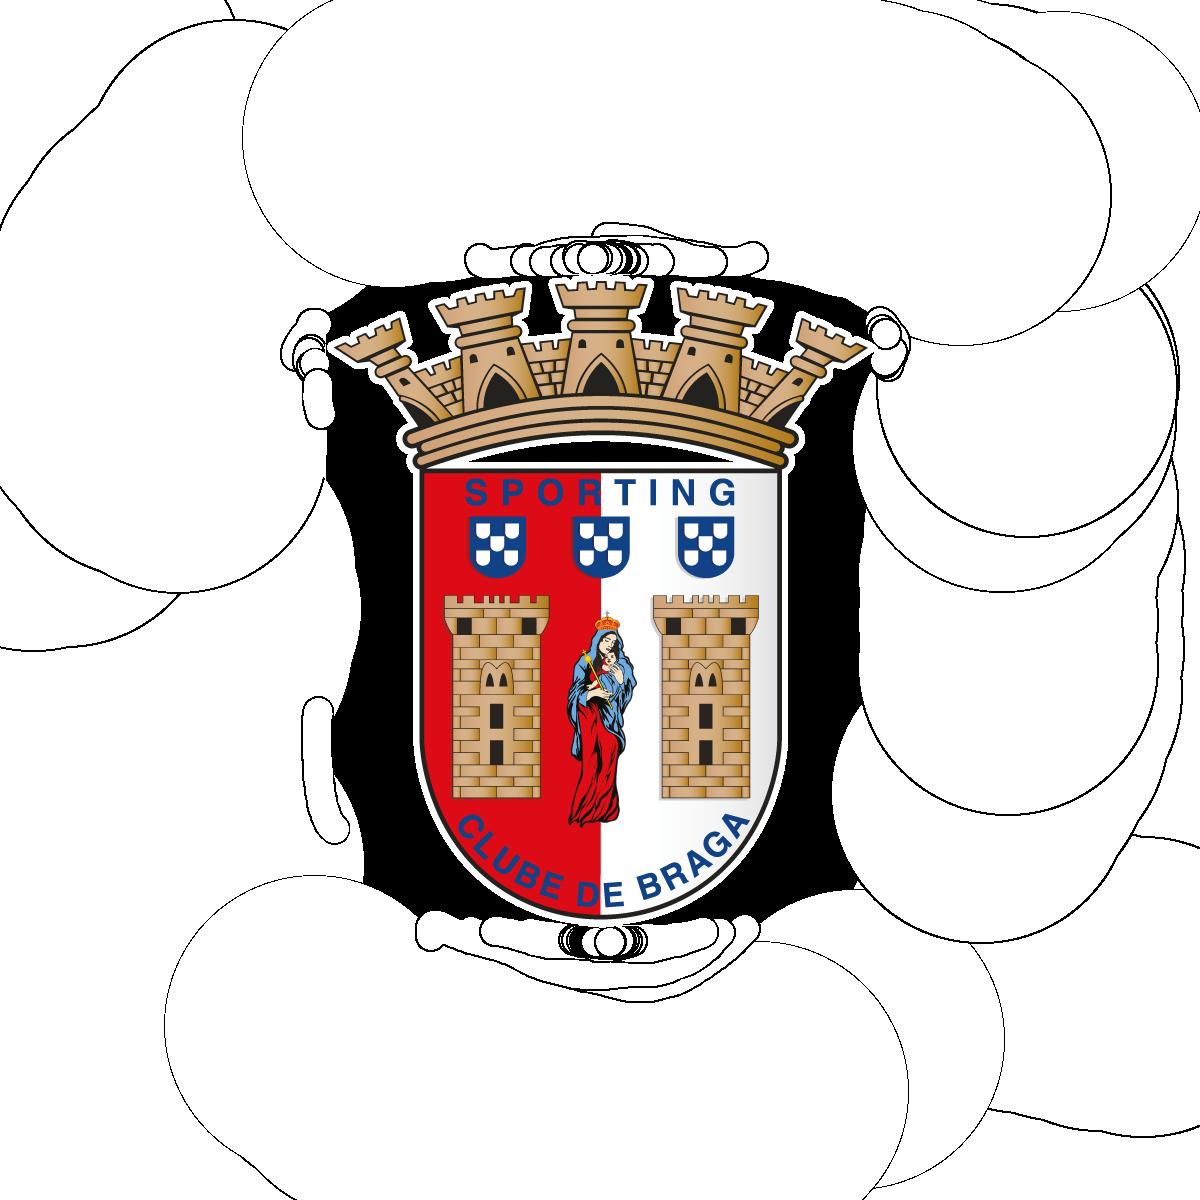 sc braga logo 0 - SC Braga Logo